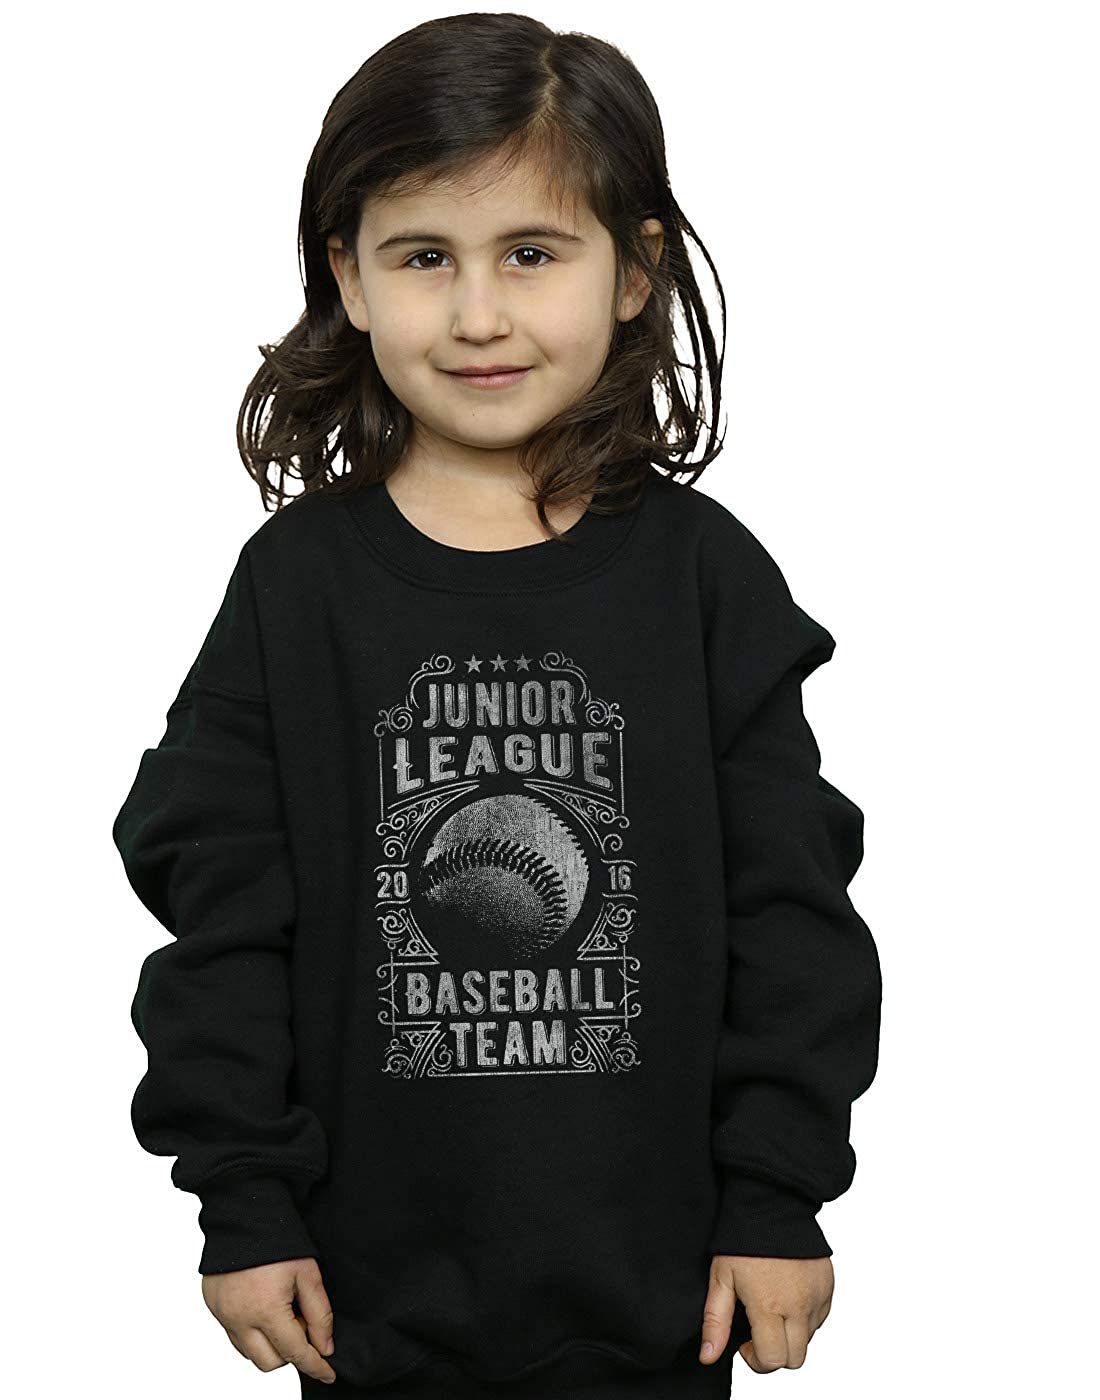 Absolute Cult Drewbacca Girls Junior Baseball League Sweatshirt